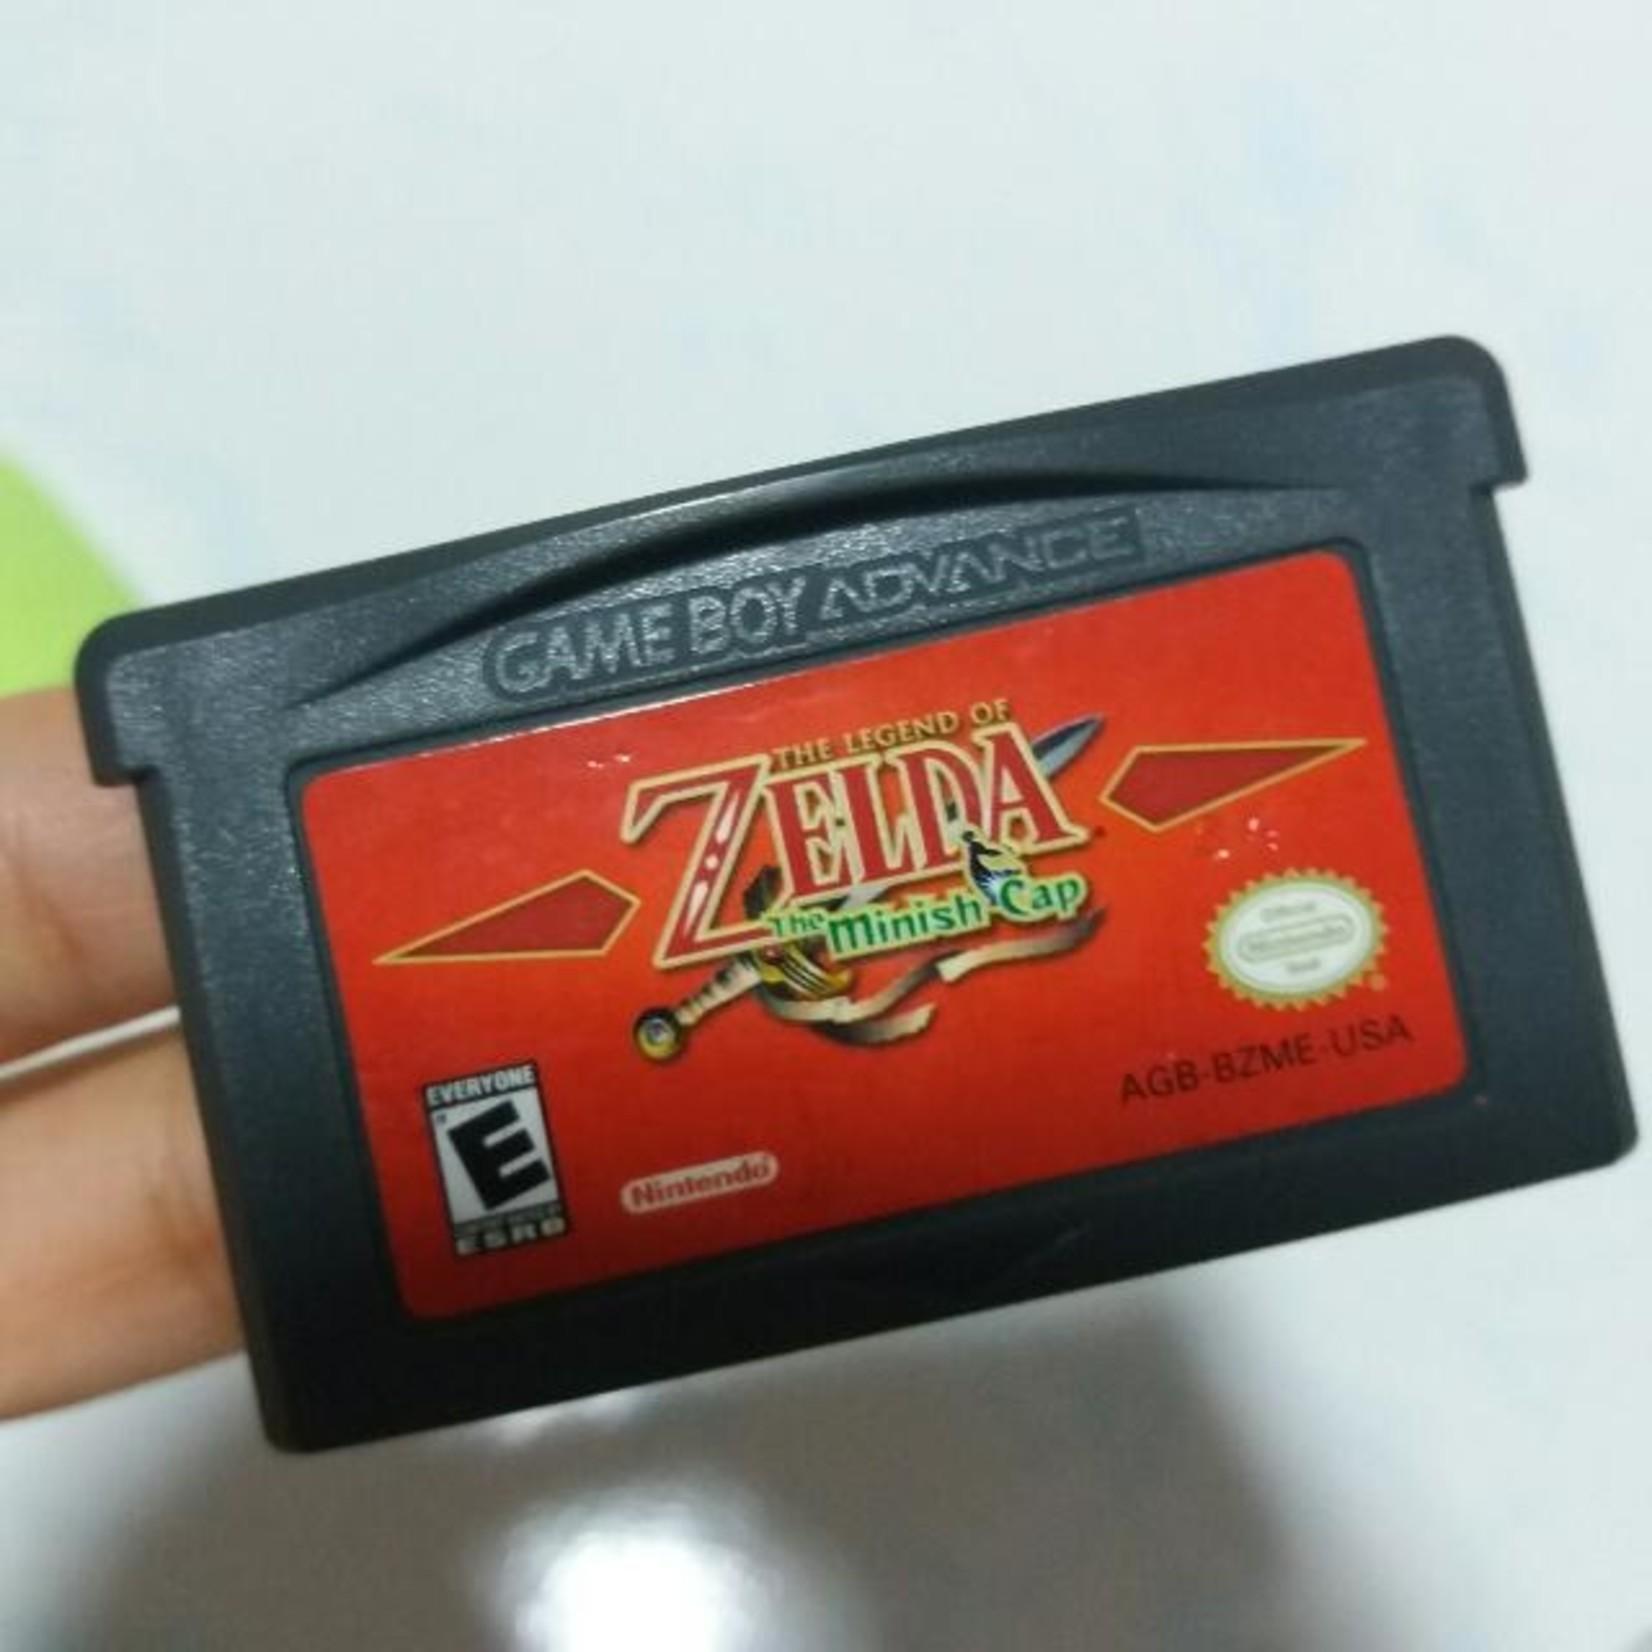 GBAU-Zelda Minish Cap (cart only)